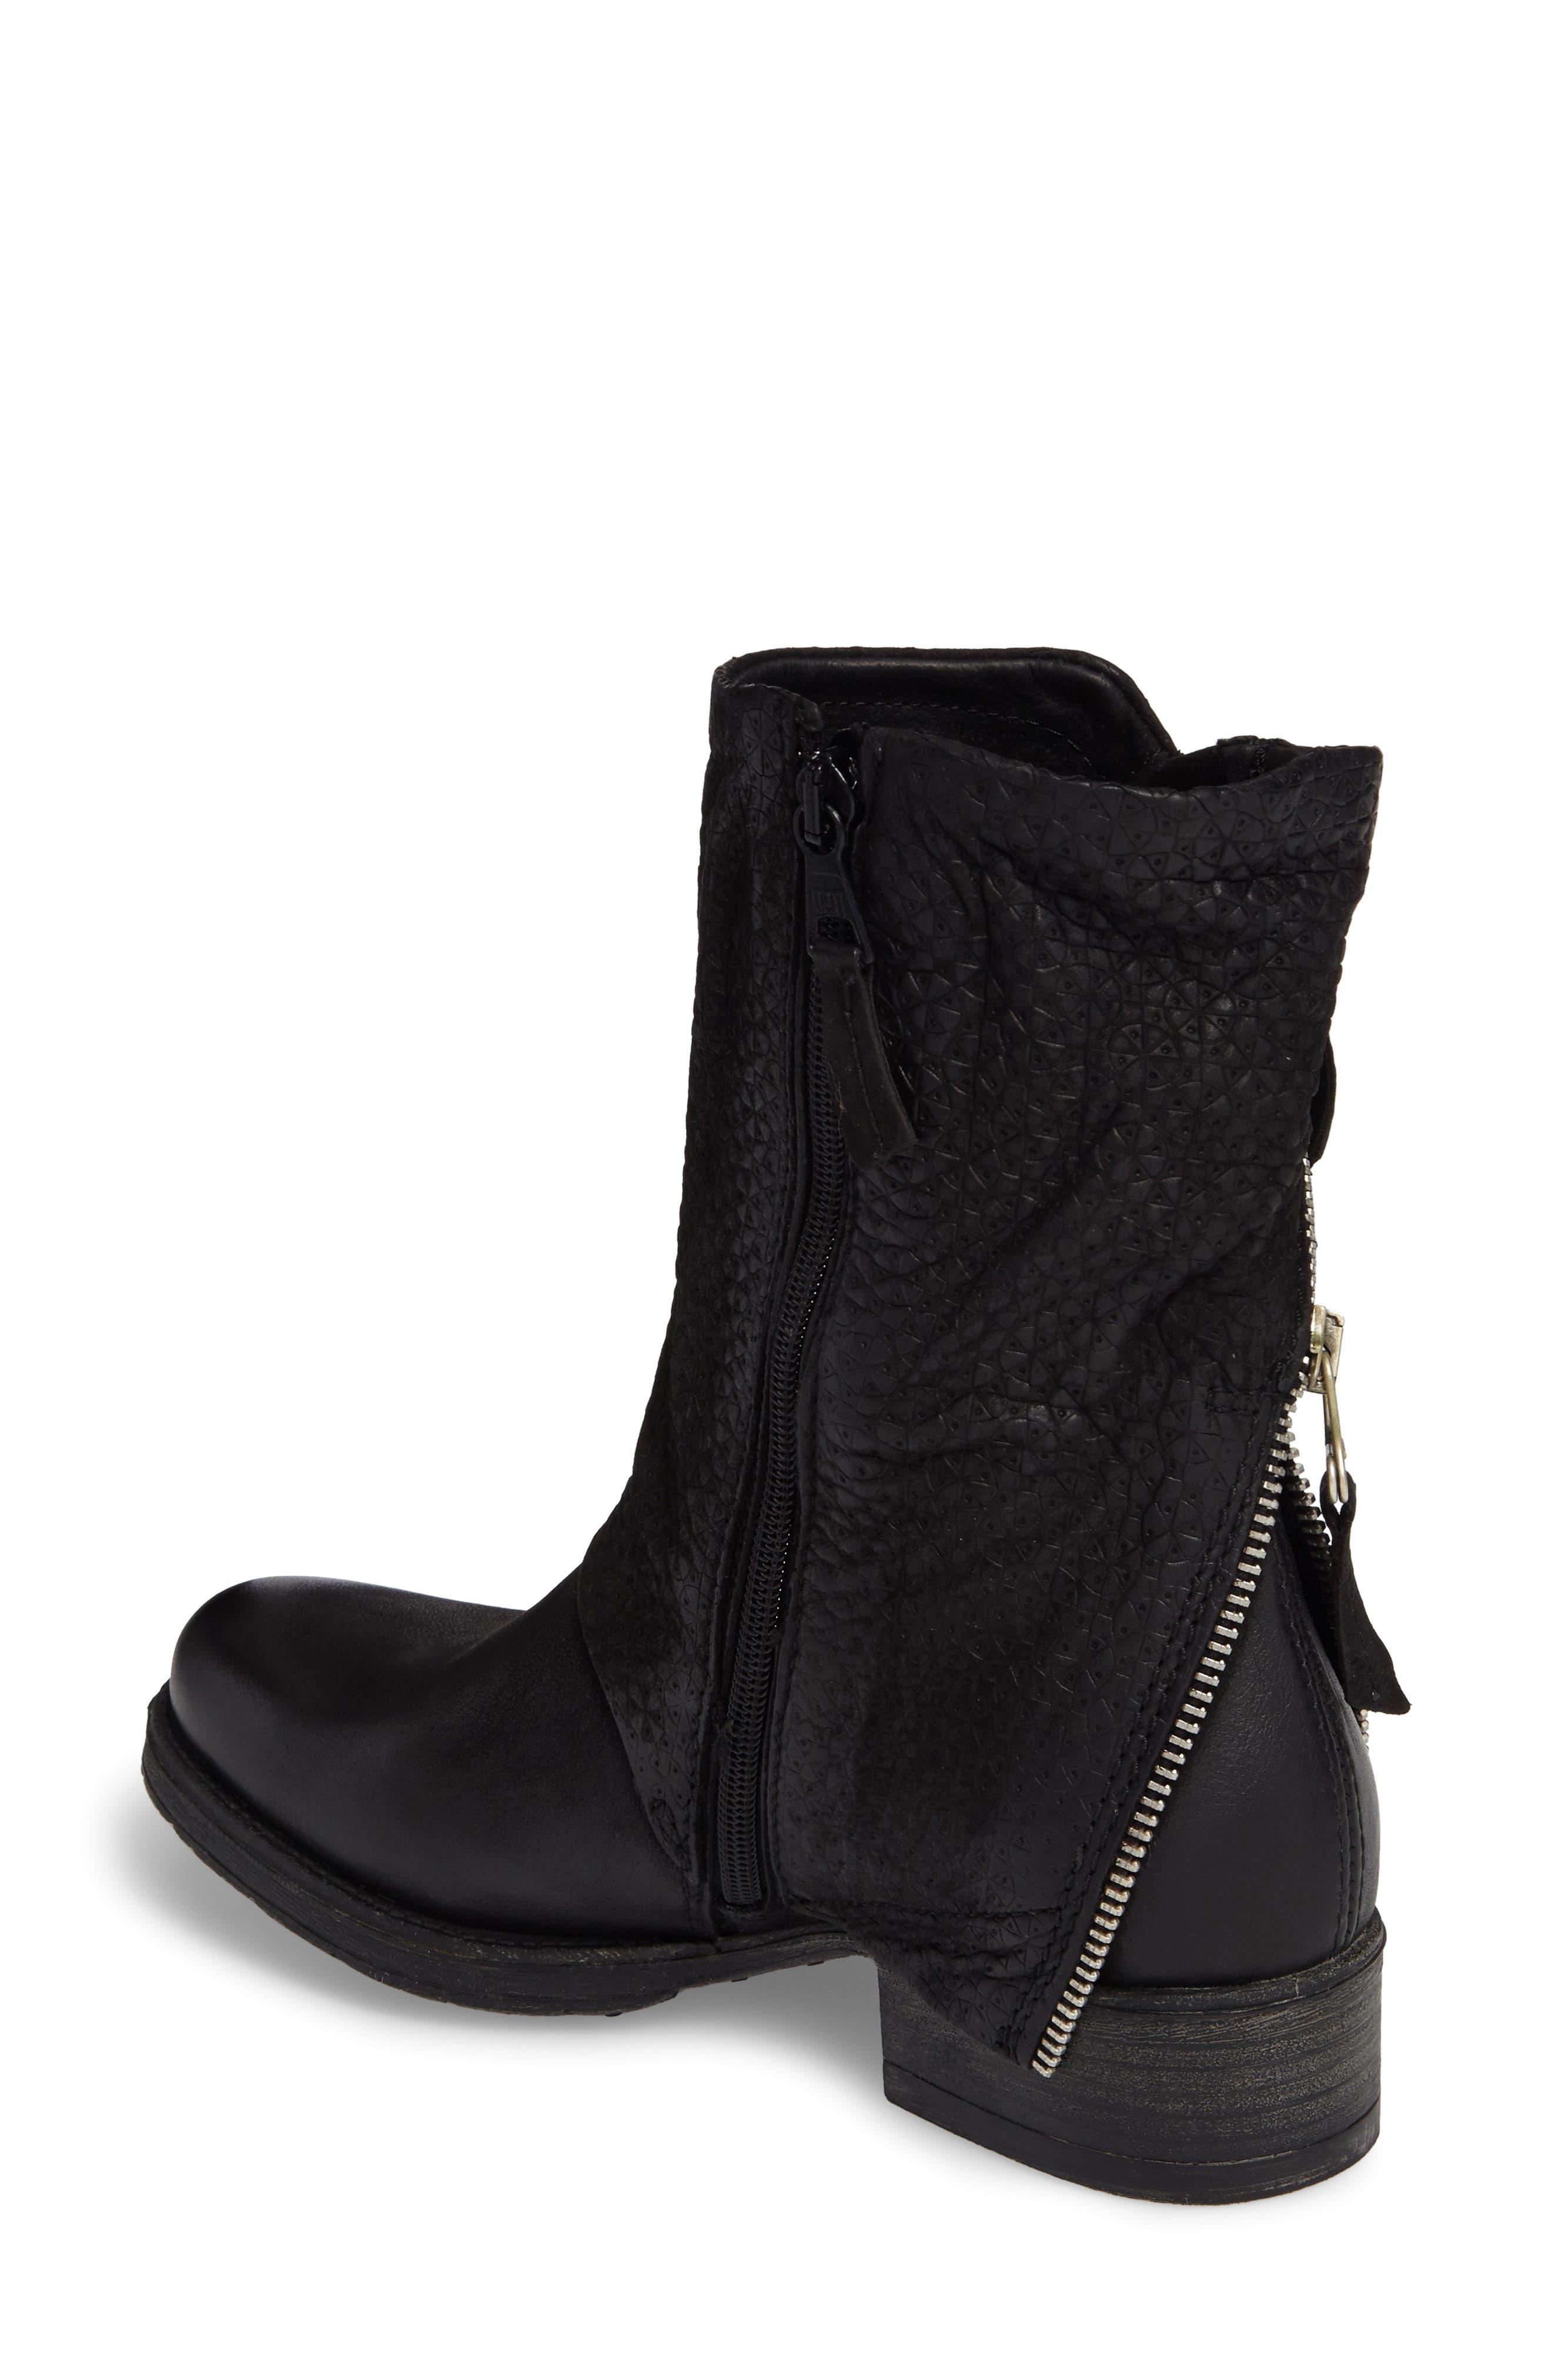 Alternate Image 2  - Miz Mooz Nugget Asymmetrical Textured Boot (Women)